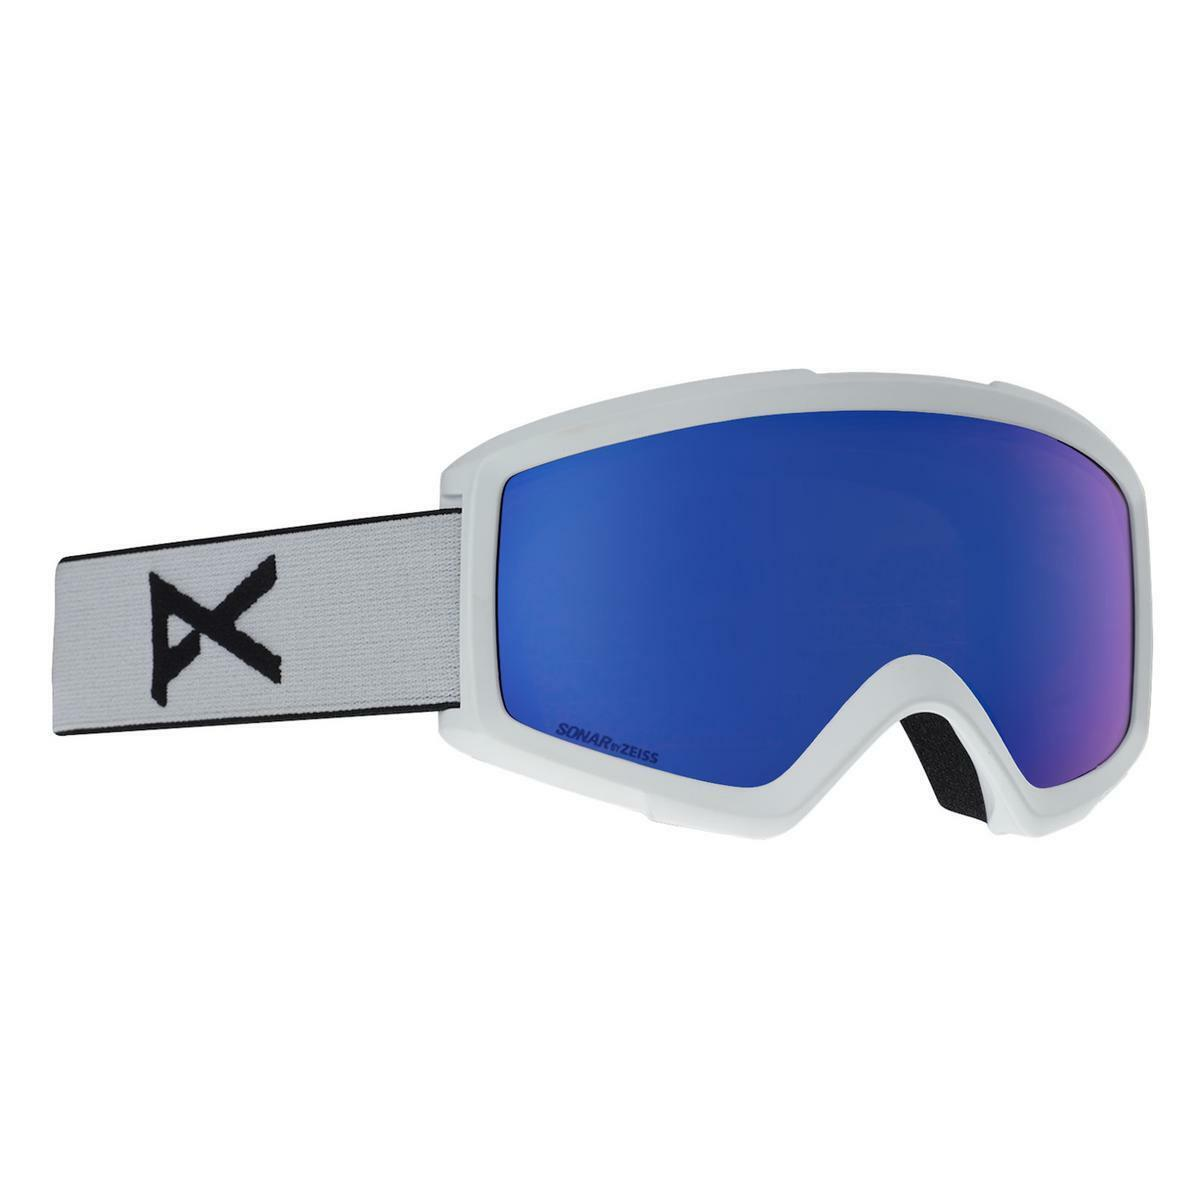 Anon Helix 2.0 Sonar Goggles White Sonar IR blueee